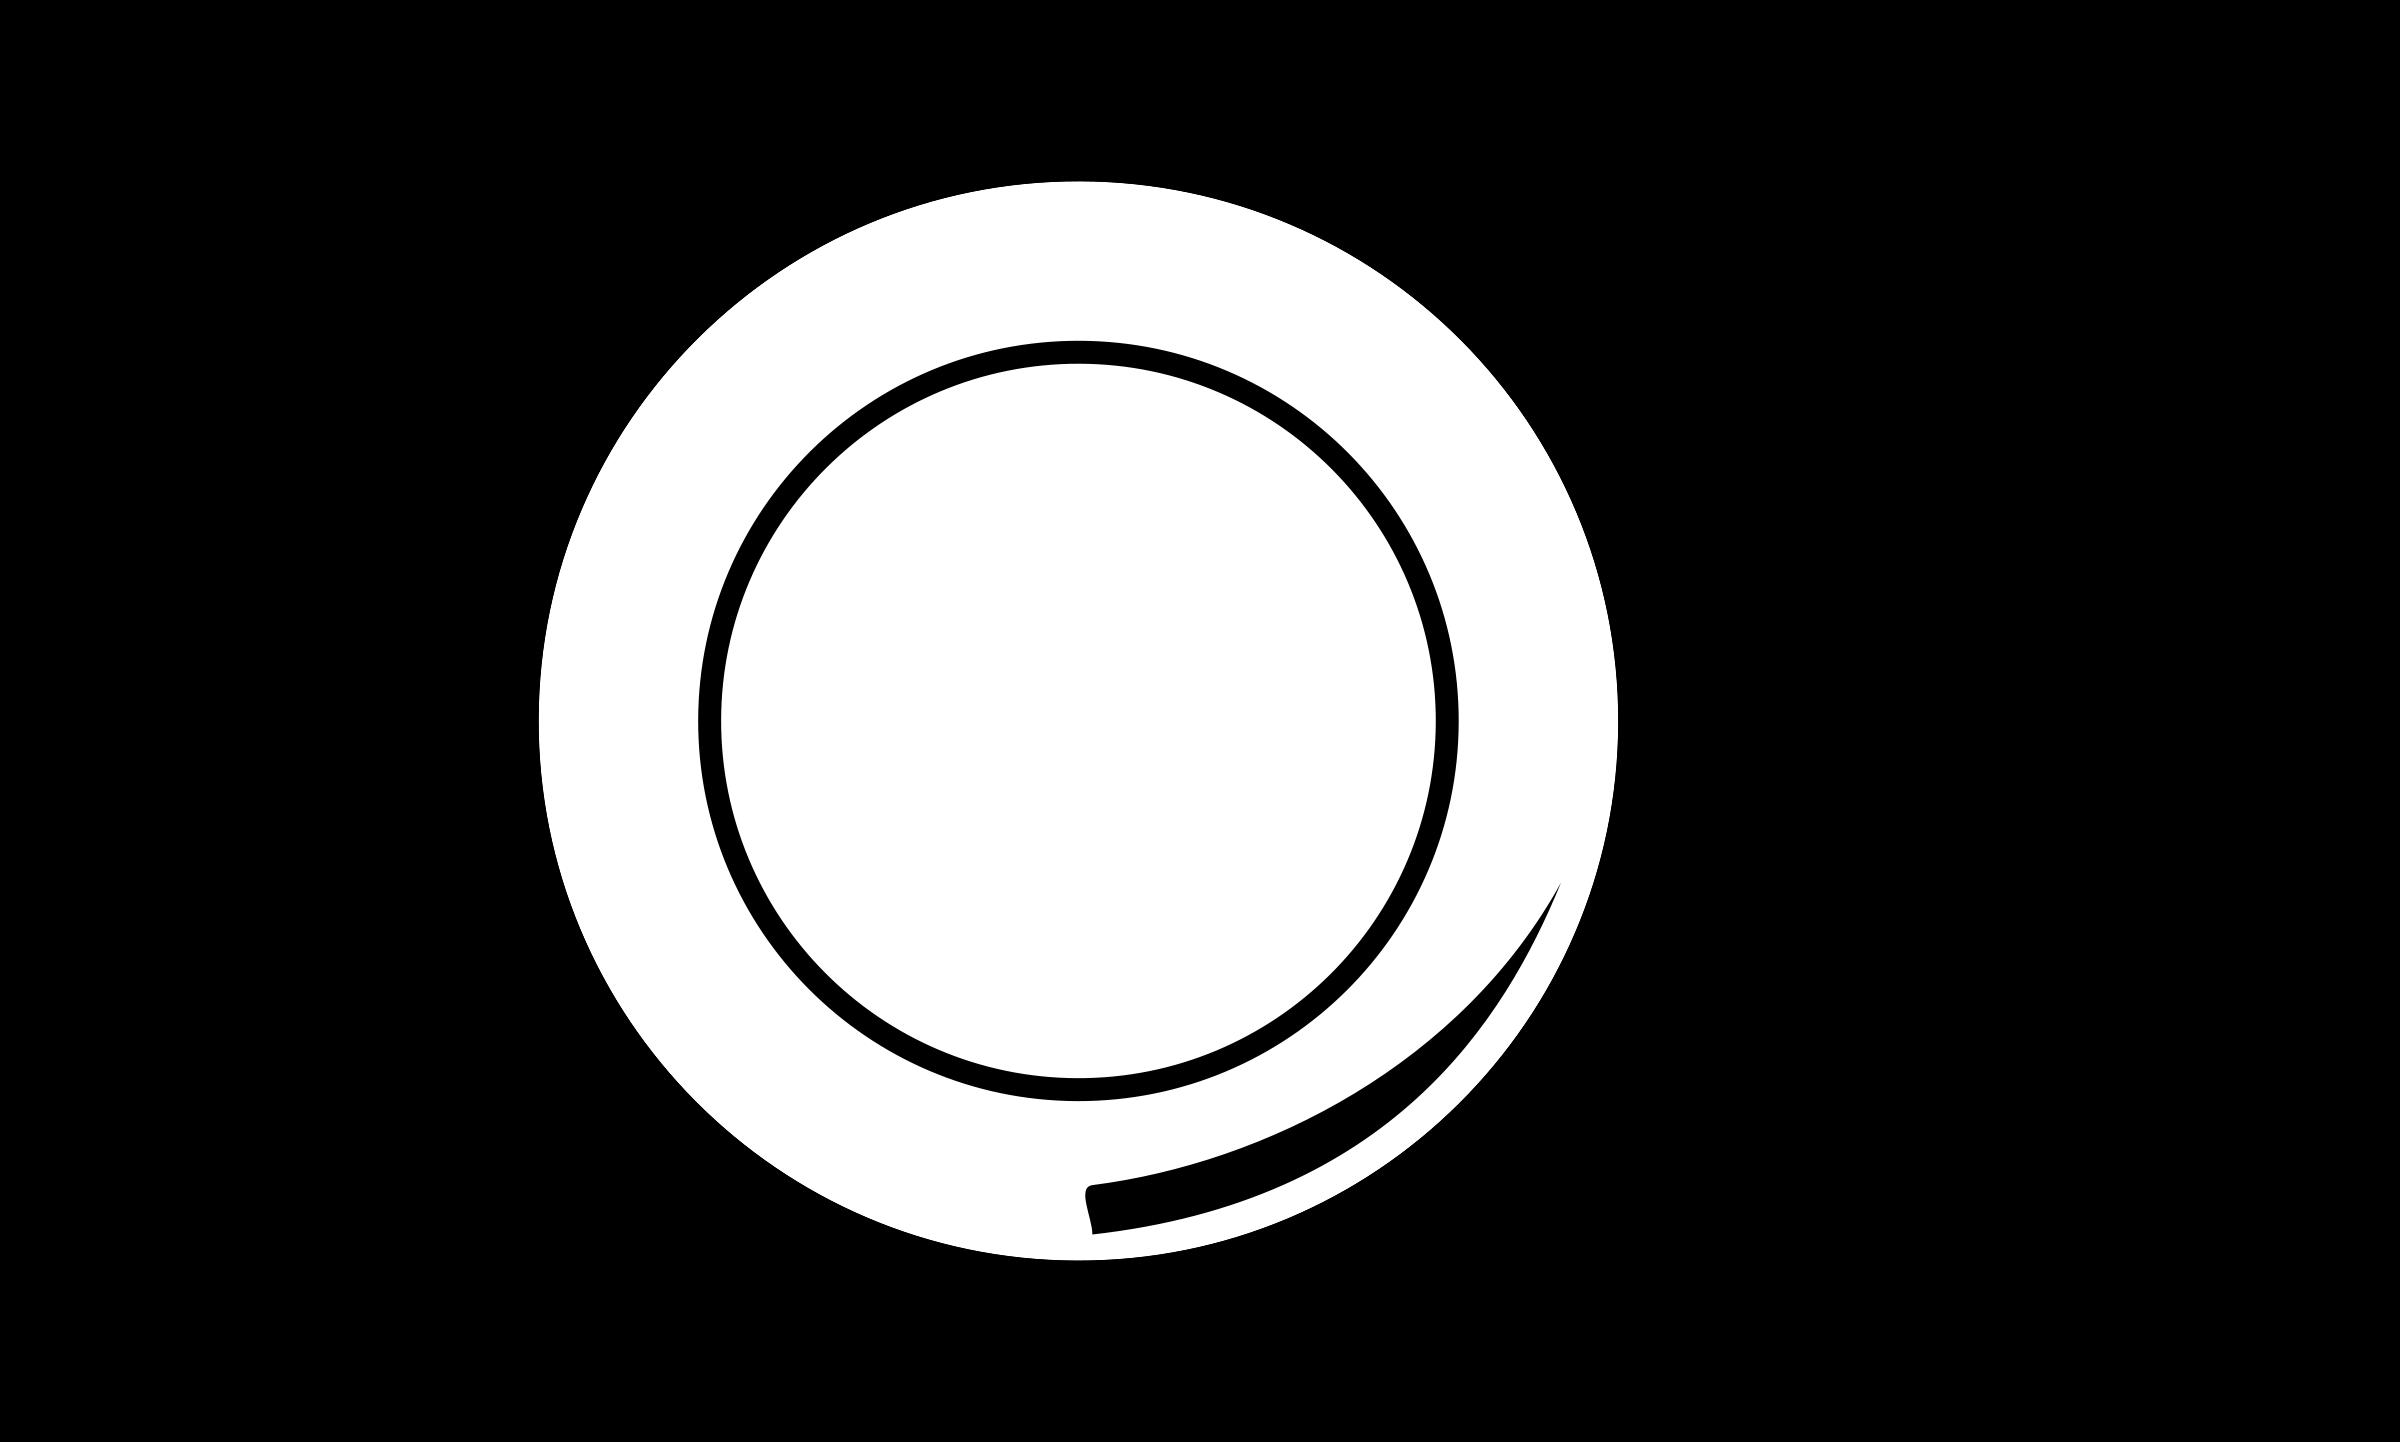 clip art black and white Napkin clipart plate napkin. Drawn fork spoon free.